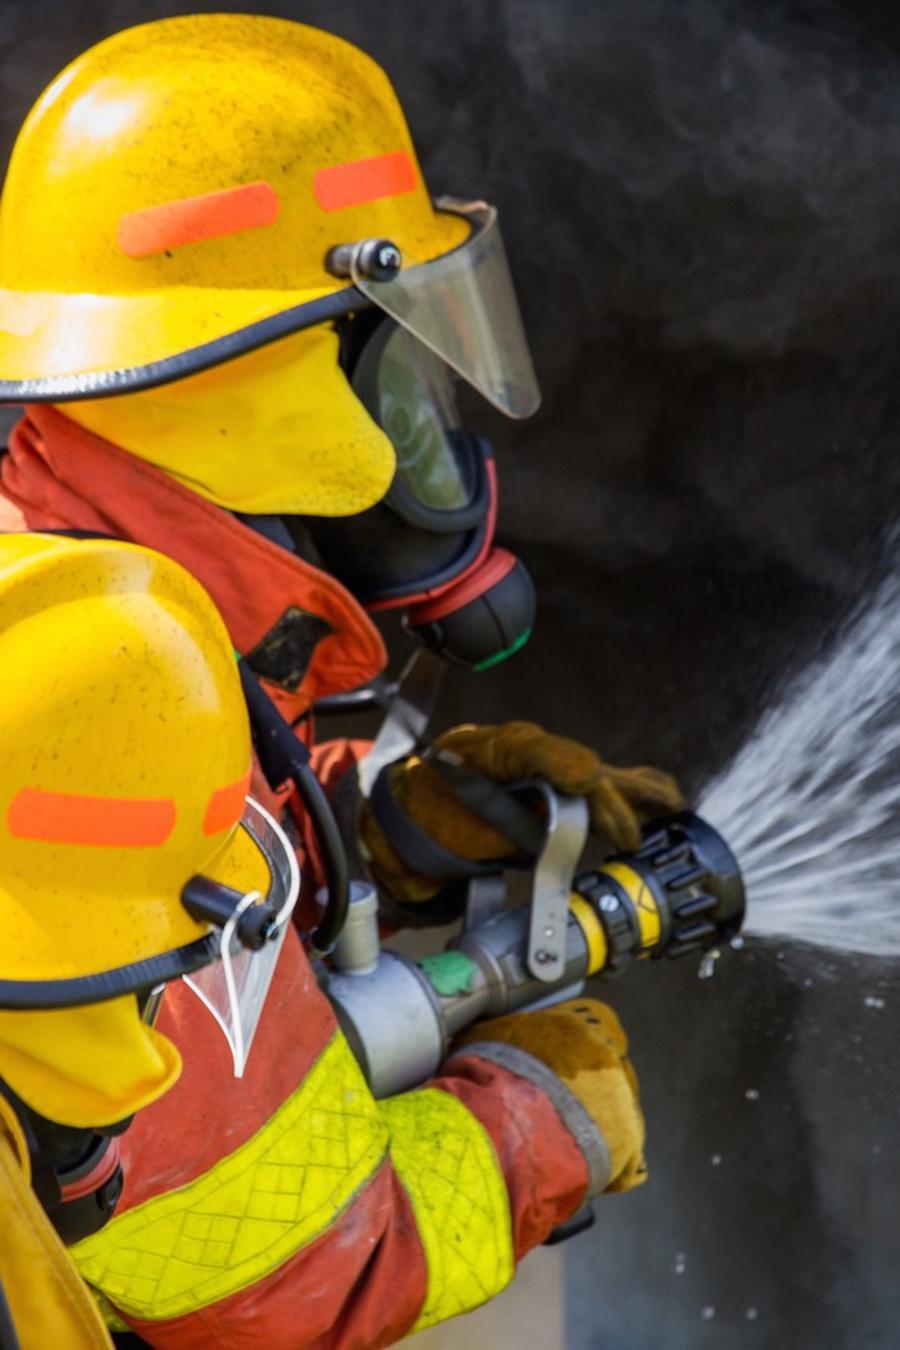 Dos bomberos usando una manguera